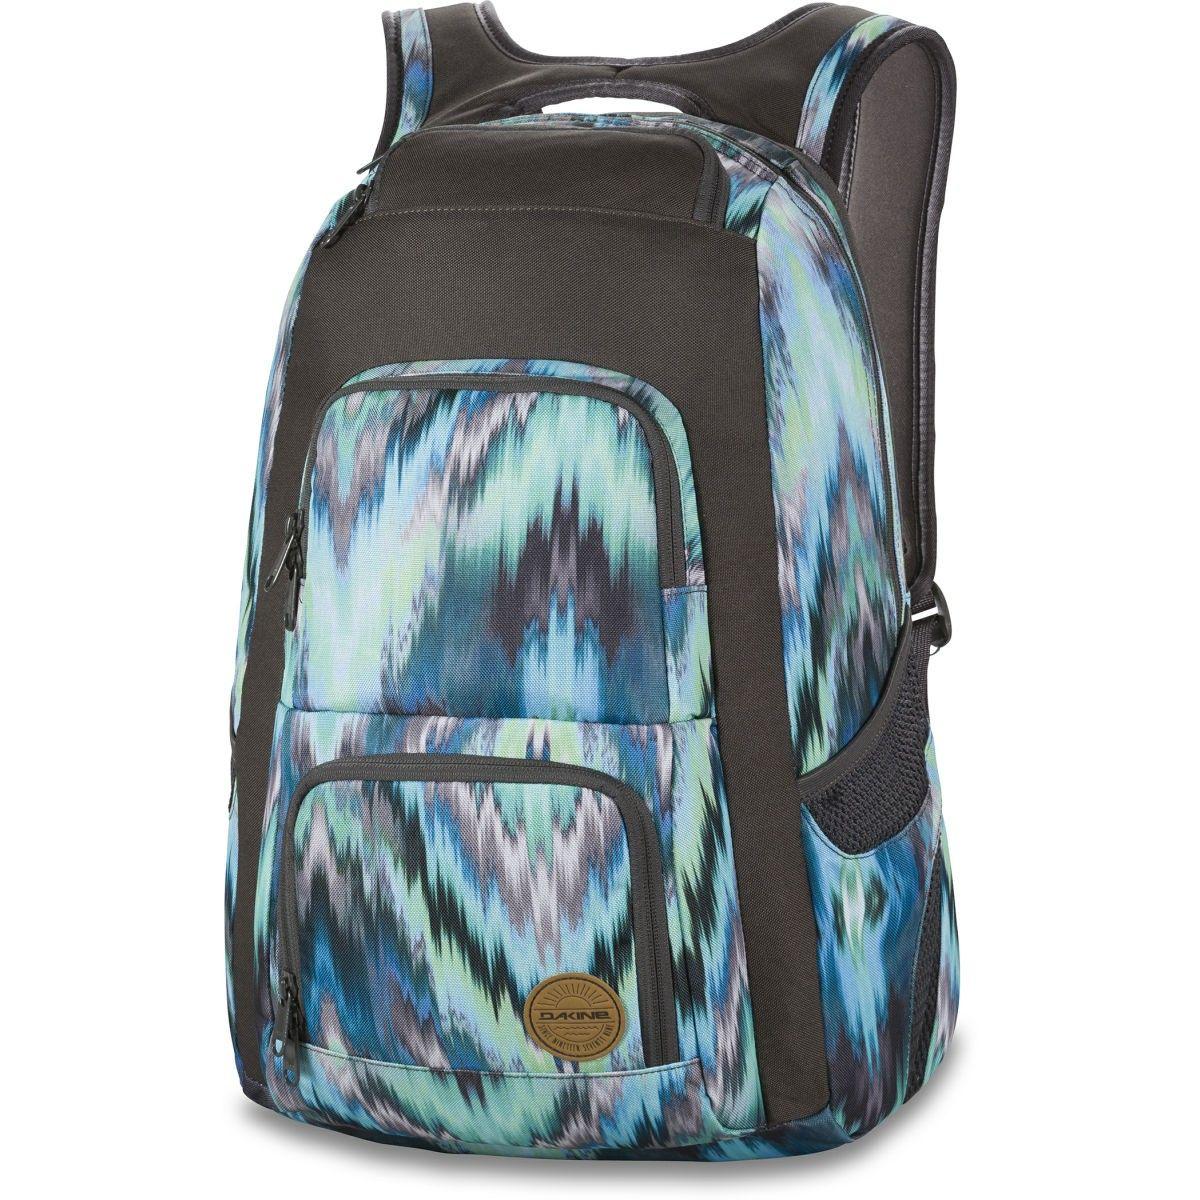 7b013316f Jewel 26L Backpack | Home decor | Backpacks, Laptop backpack, Jewels